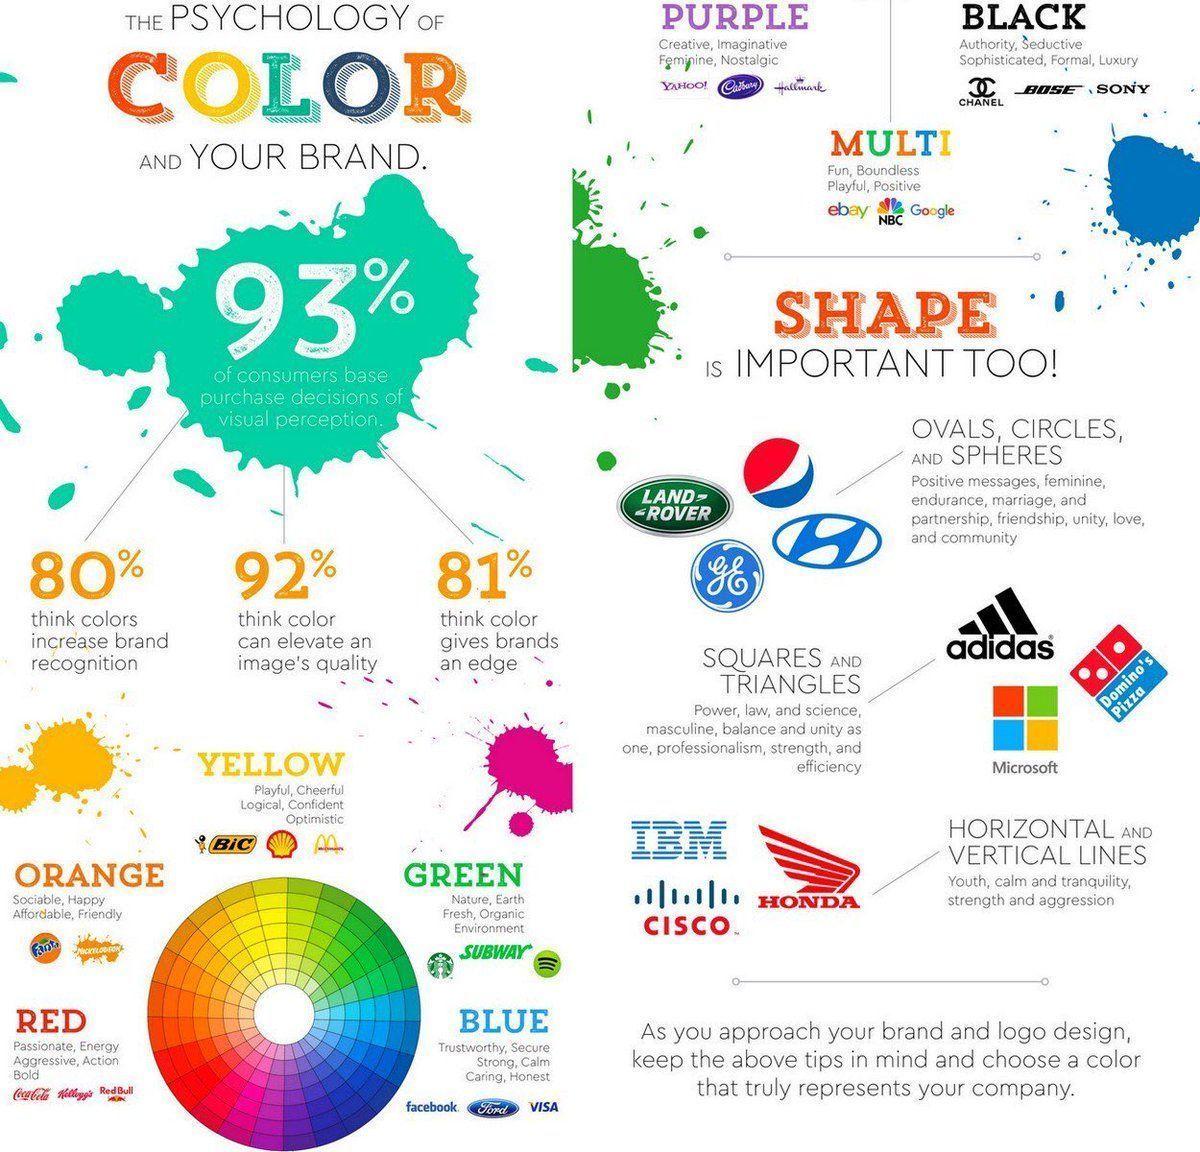 Colour and #branding #Marketing #SEO #Digitalmarketing #Mpgvip #defstar5 #growthhacking #SEM #socialmedia #SMM #PPC #ContentMarketing  #SPDC<br>http://pic.twitter.com/ipAvSiMHKN